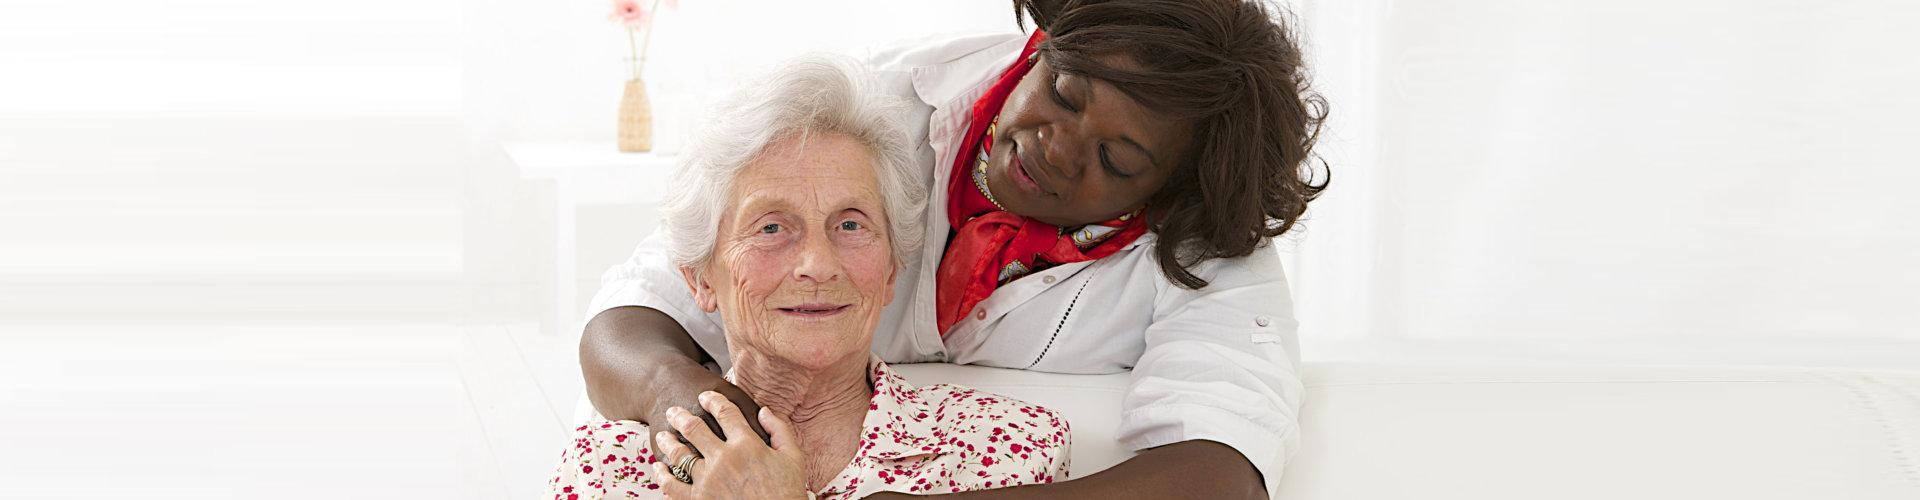 Companion Care Elderly Companion Care